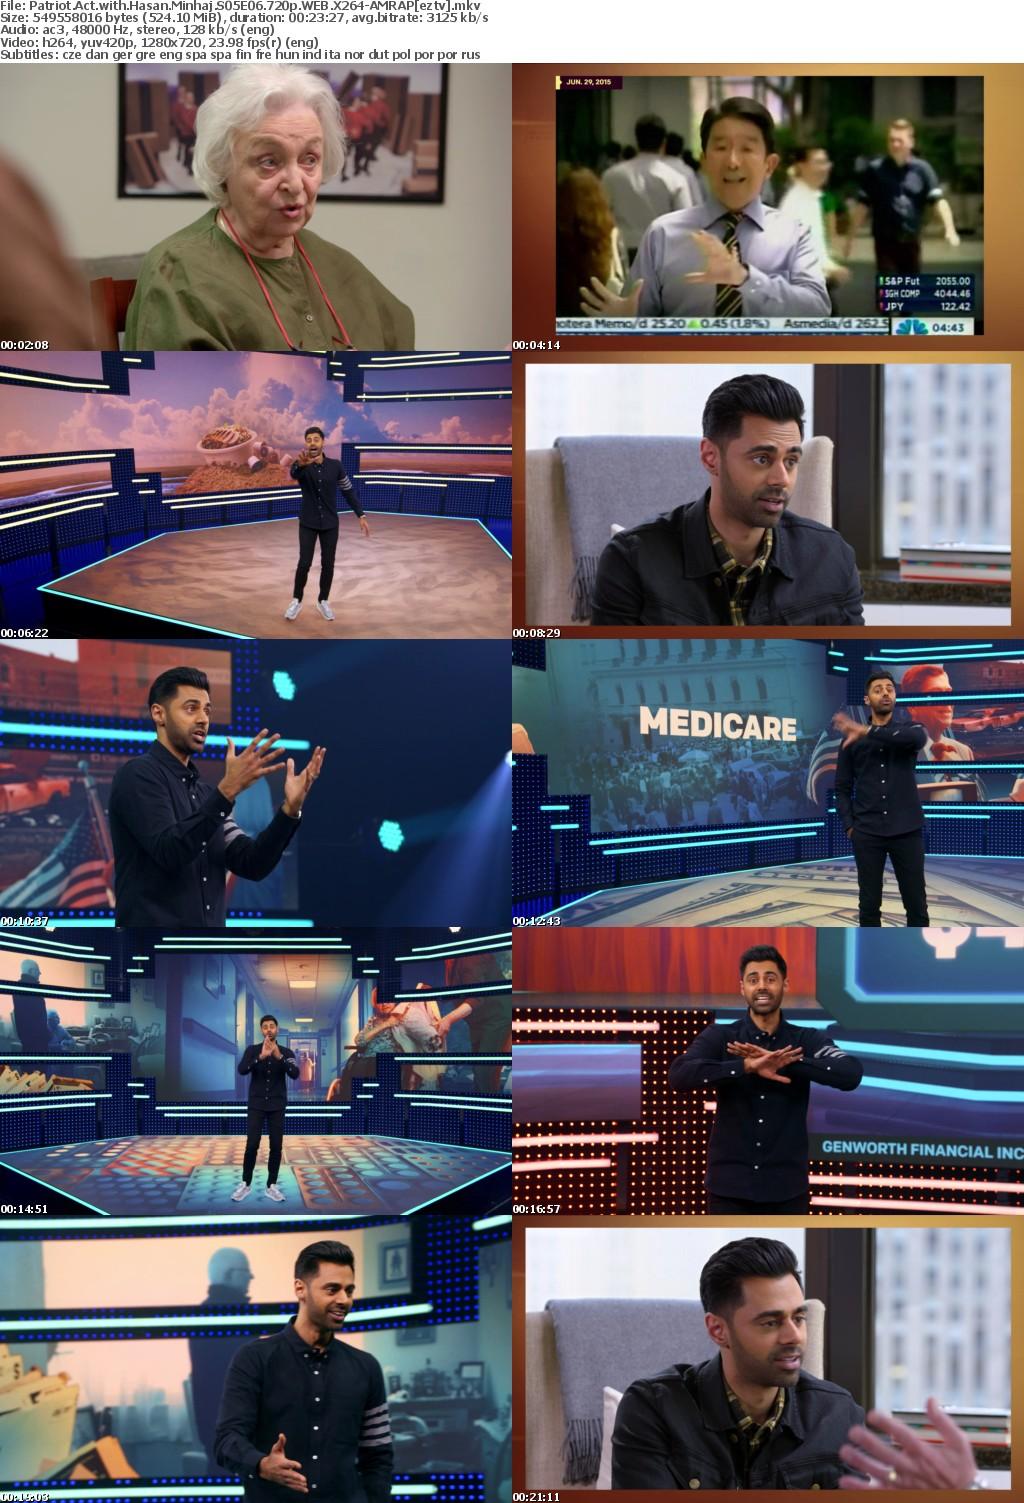 Patriot Act with Hasan Minhaj S05E06 720p WEB X264-AMRAP